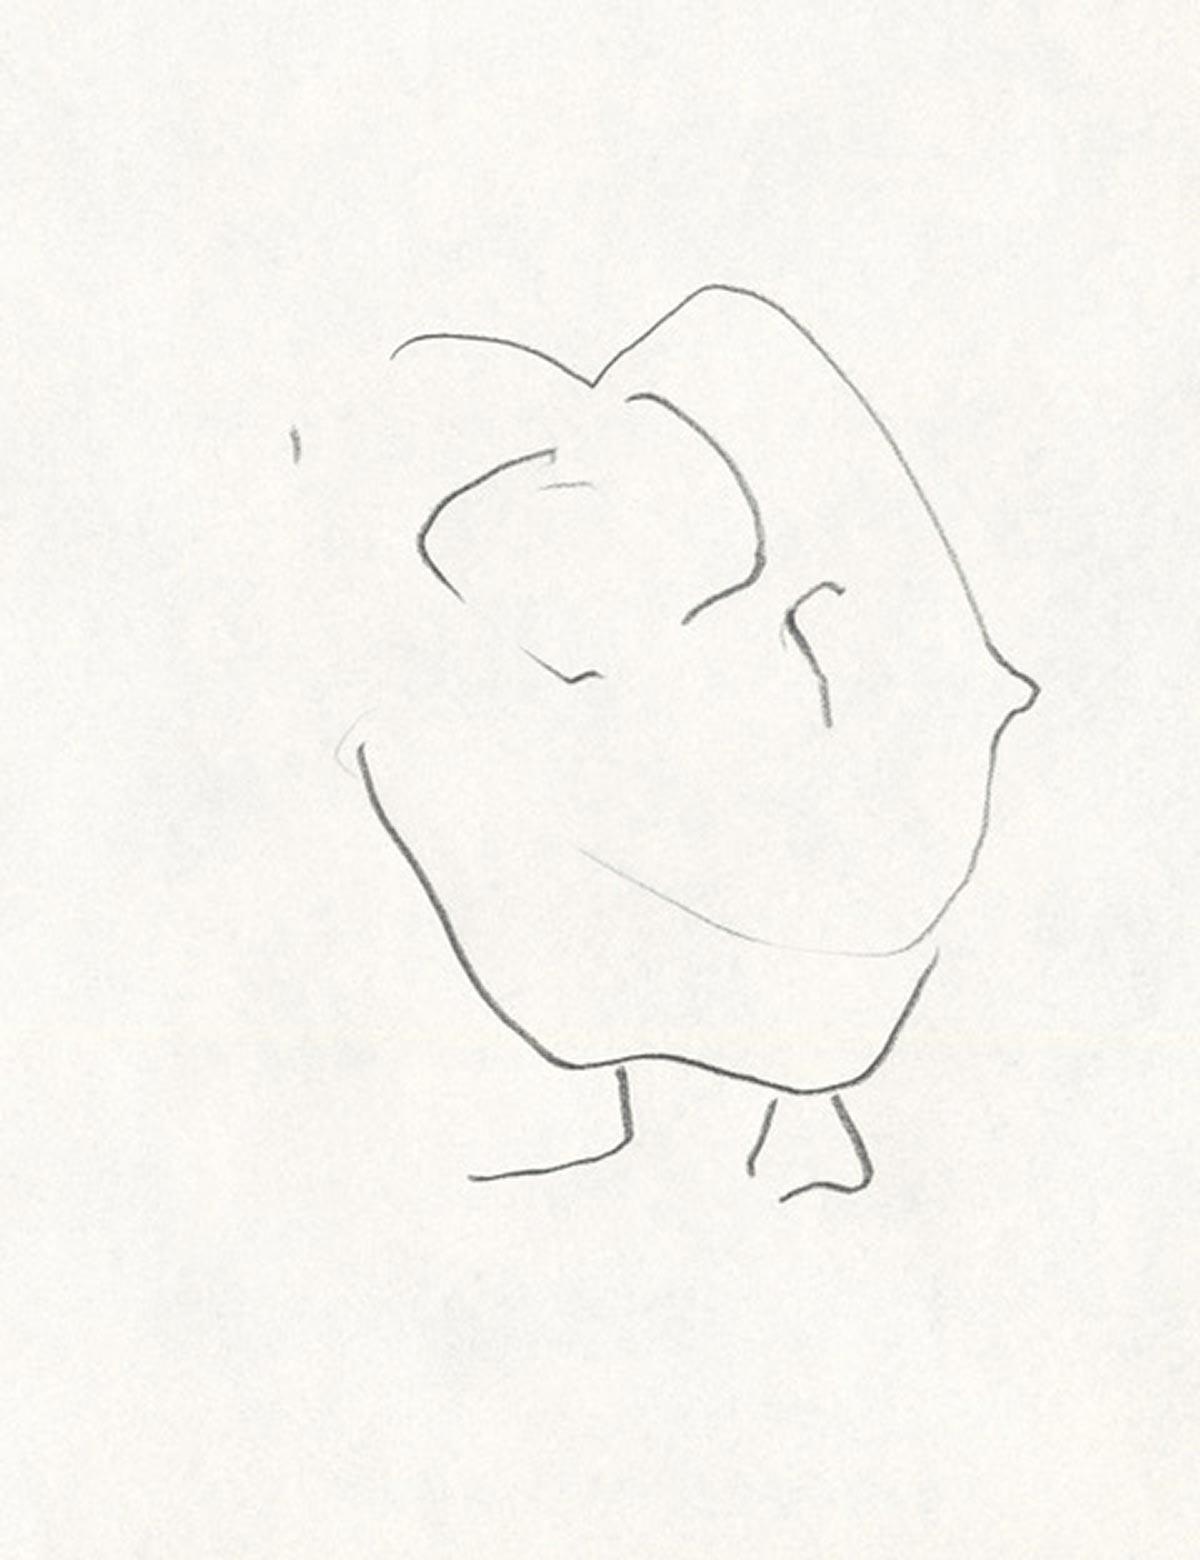 Maurice crayon